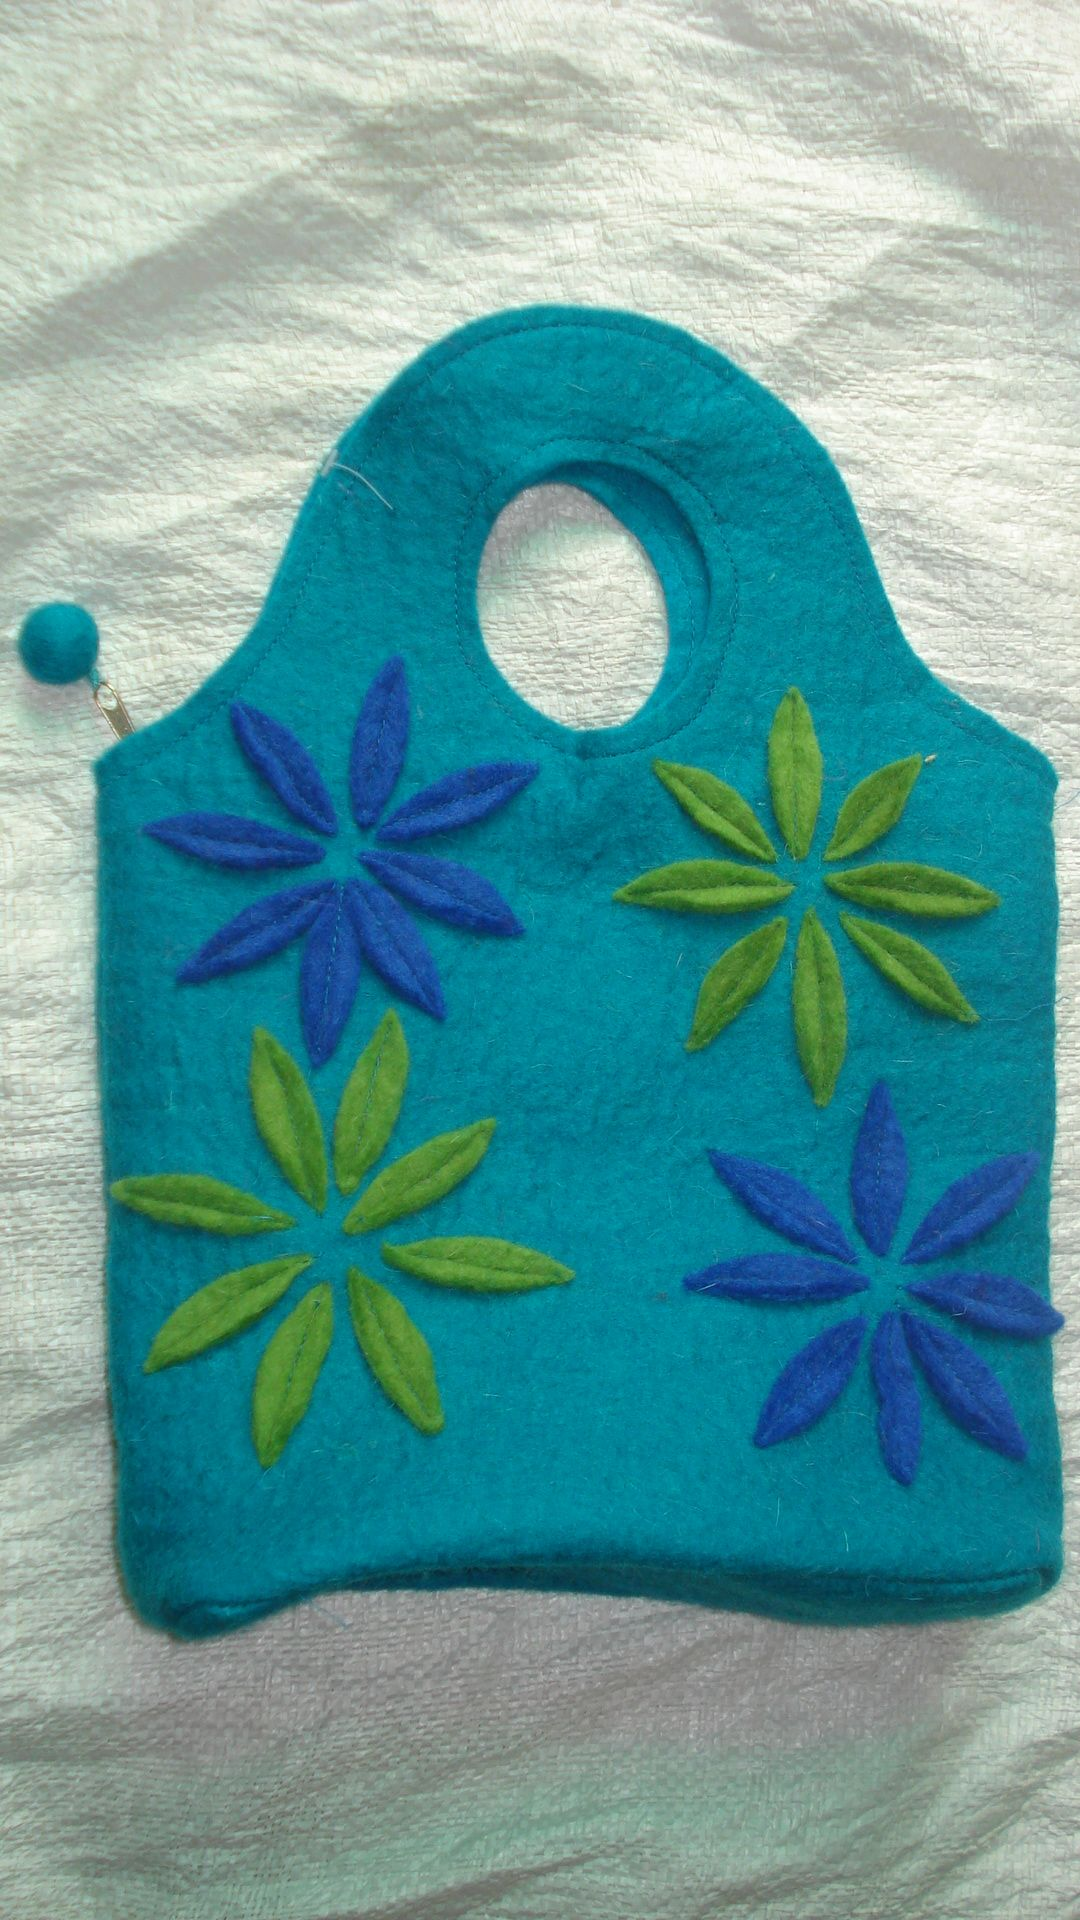 Wool Craft Ideas For Kids Part - 30: Felt Wool DIY U0026 Crafts Felt Wool Craft Handicraft Felt Craft Supplies Felt  Craft Design Felt Craft Patterns Felt Craft Ideas Felt Craft For Kids Felt  Craft ...